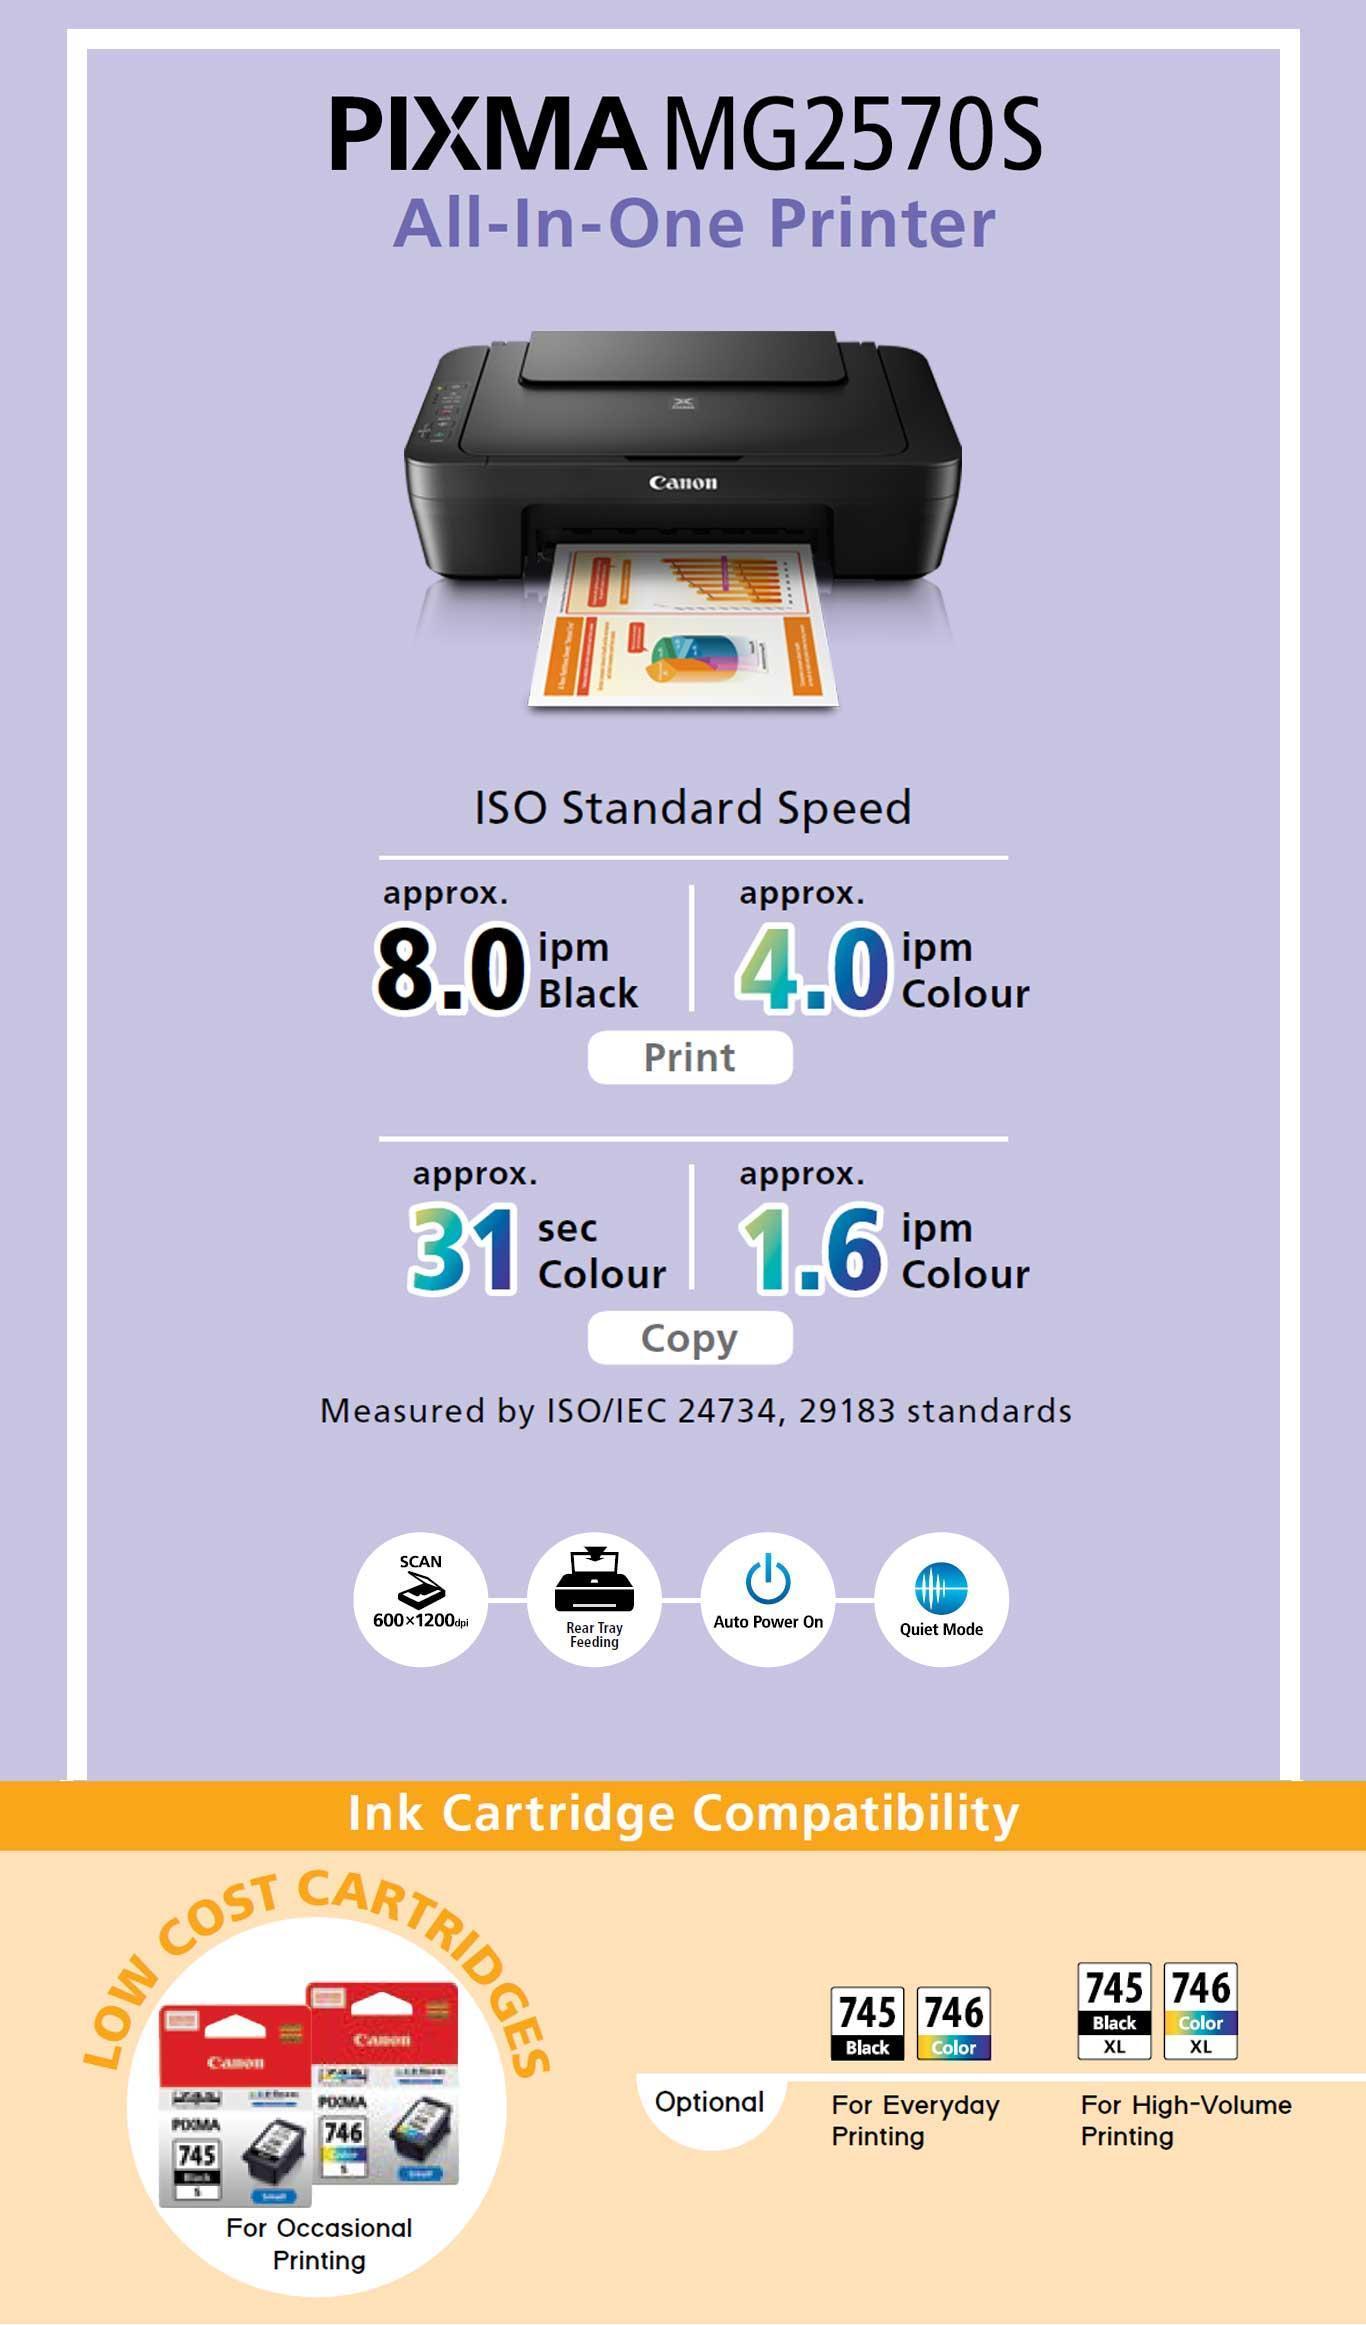 CanonPixmaMG2570S_Description.jpg